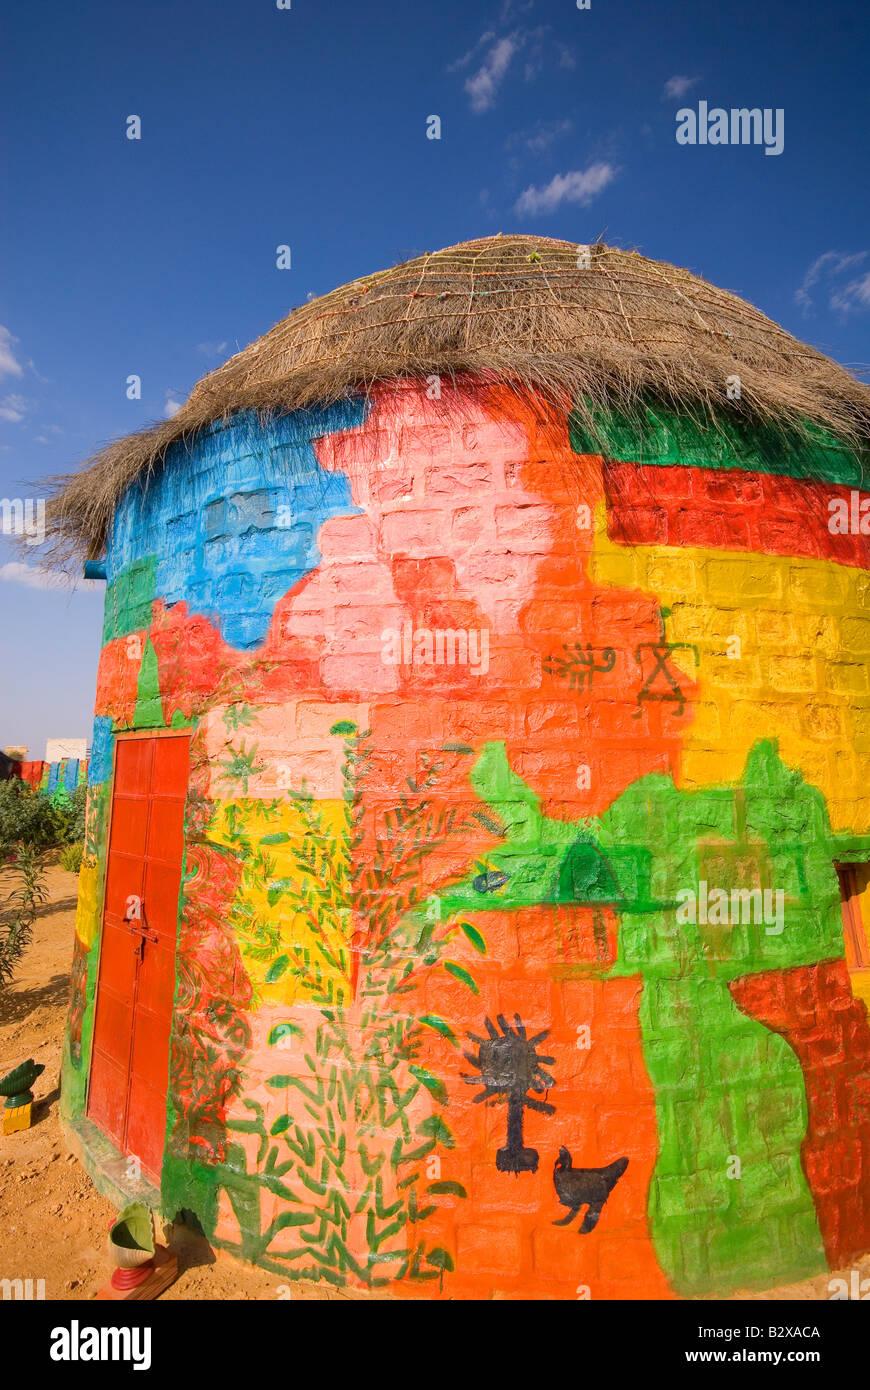 Artist Colony, Great Thar Desert, near Jaisalmer, Rajasthan, India, Subcontinent, Asia Stock Foto